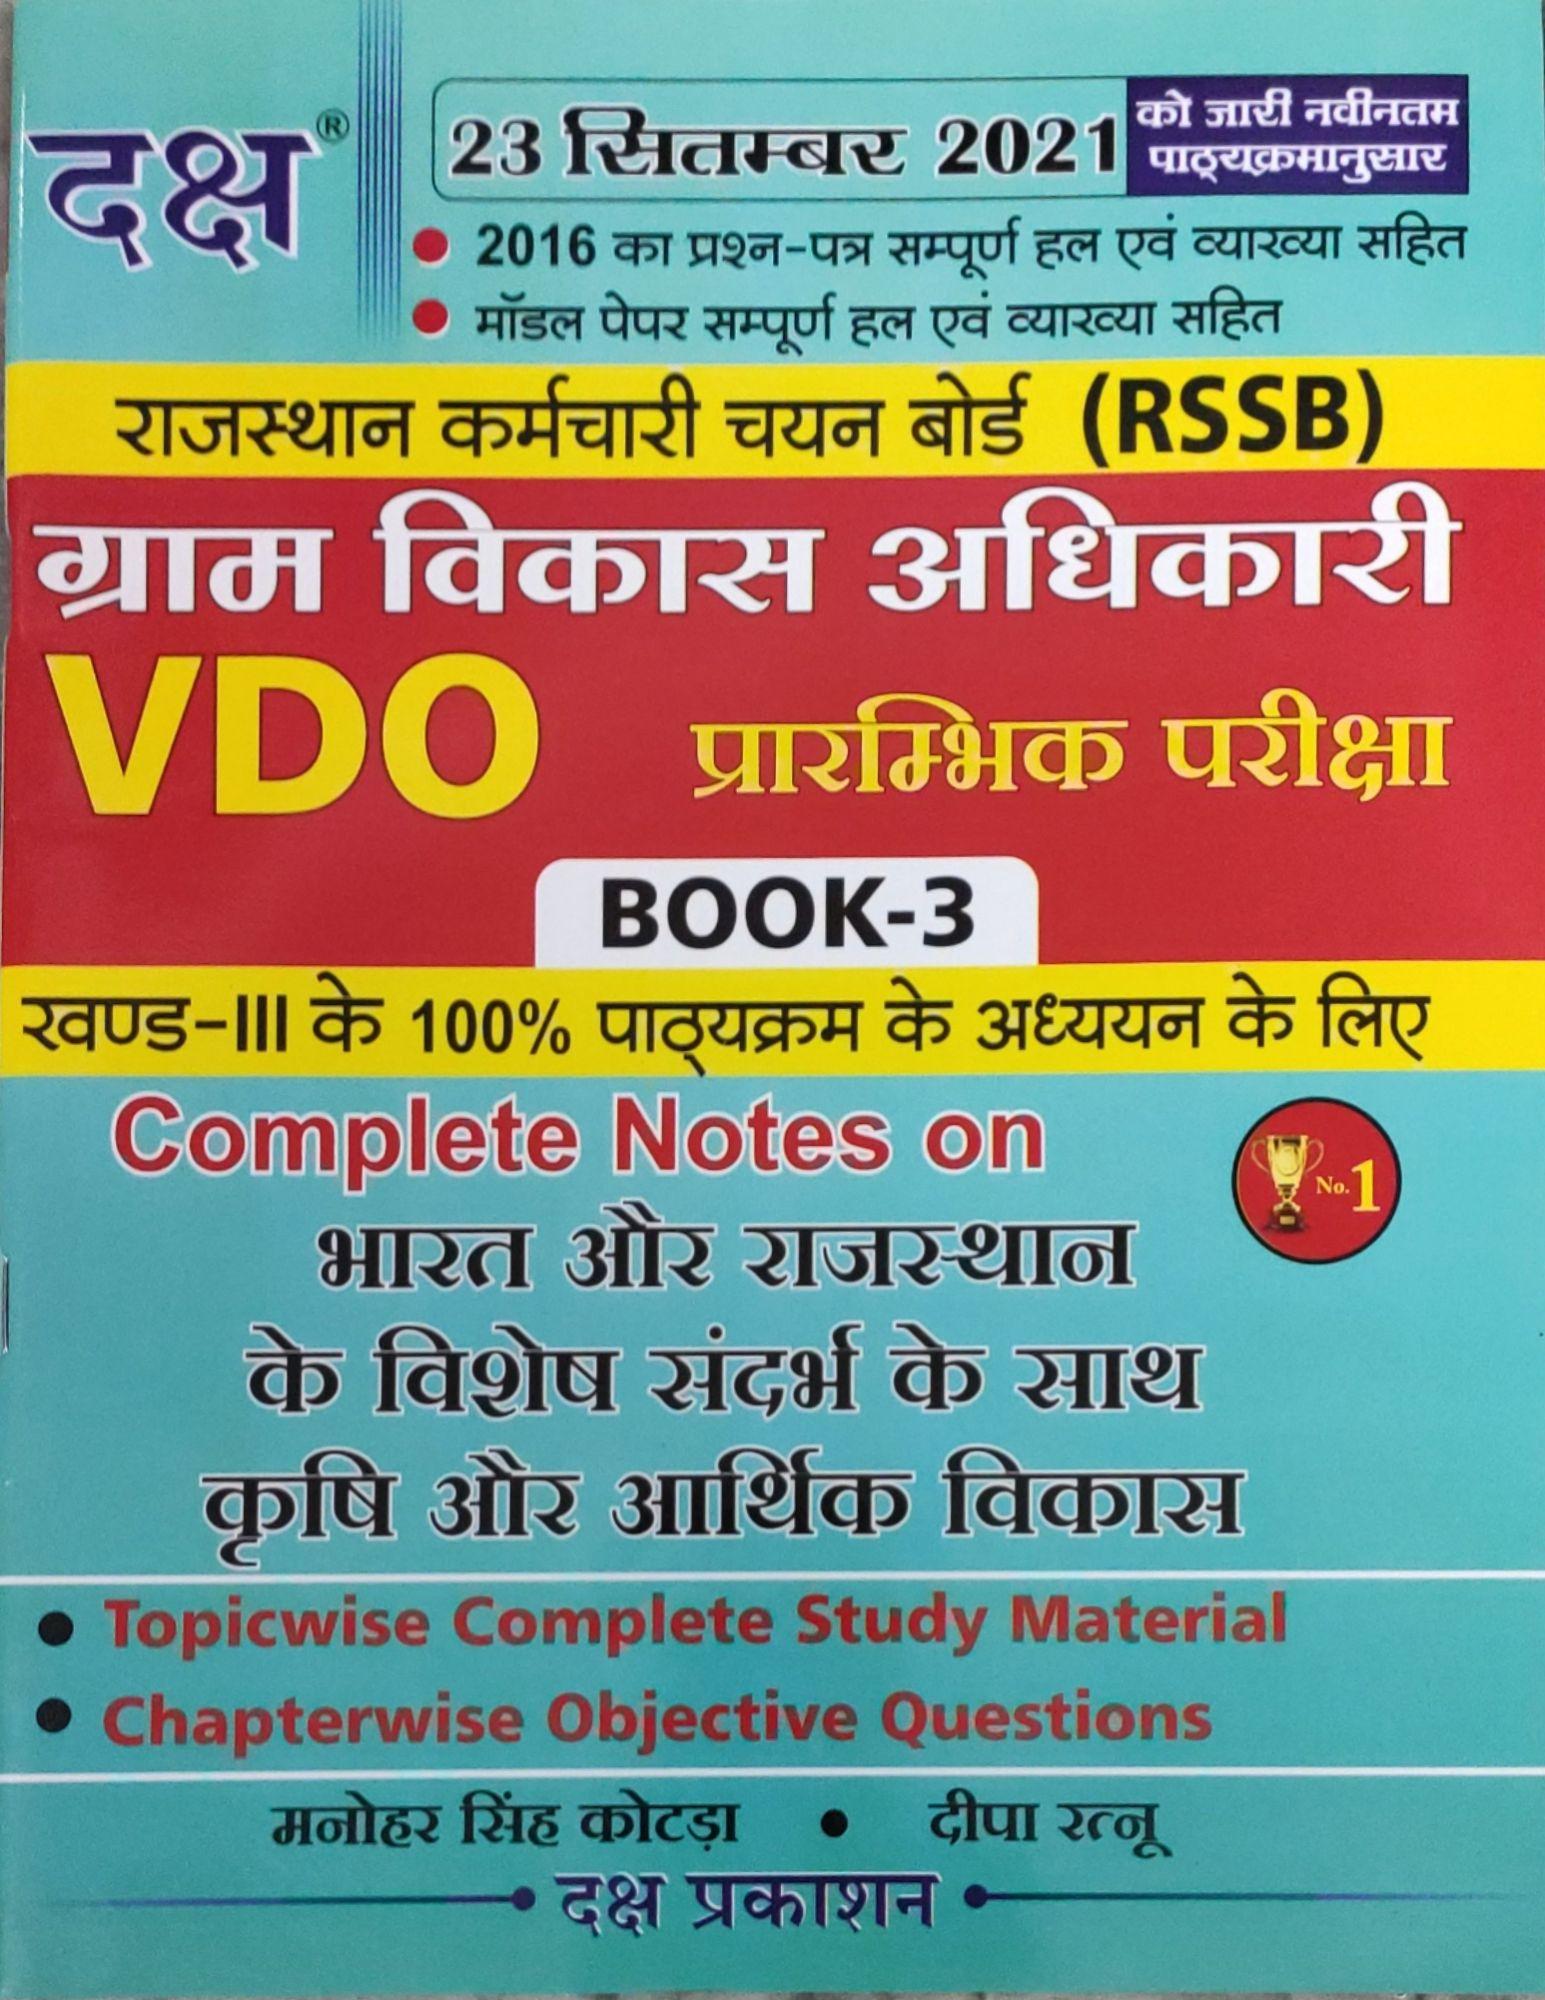 Daksh  publication RSSB gram vikash adhikari vdo part -3 complete notes 2021